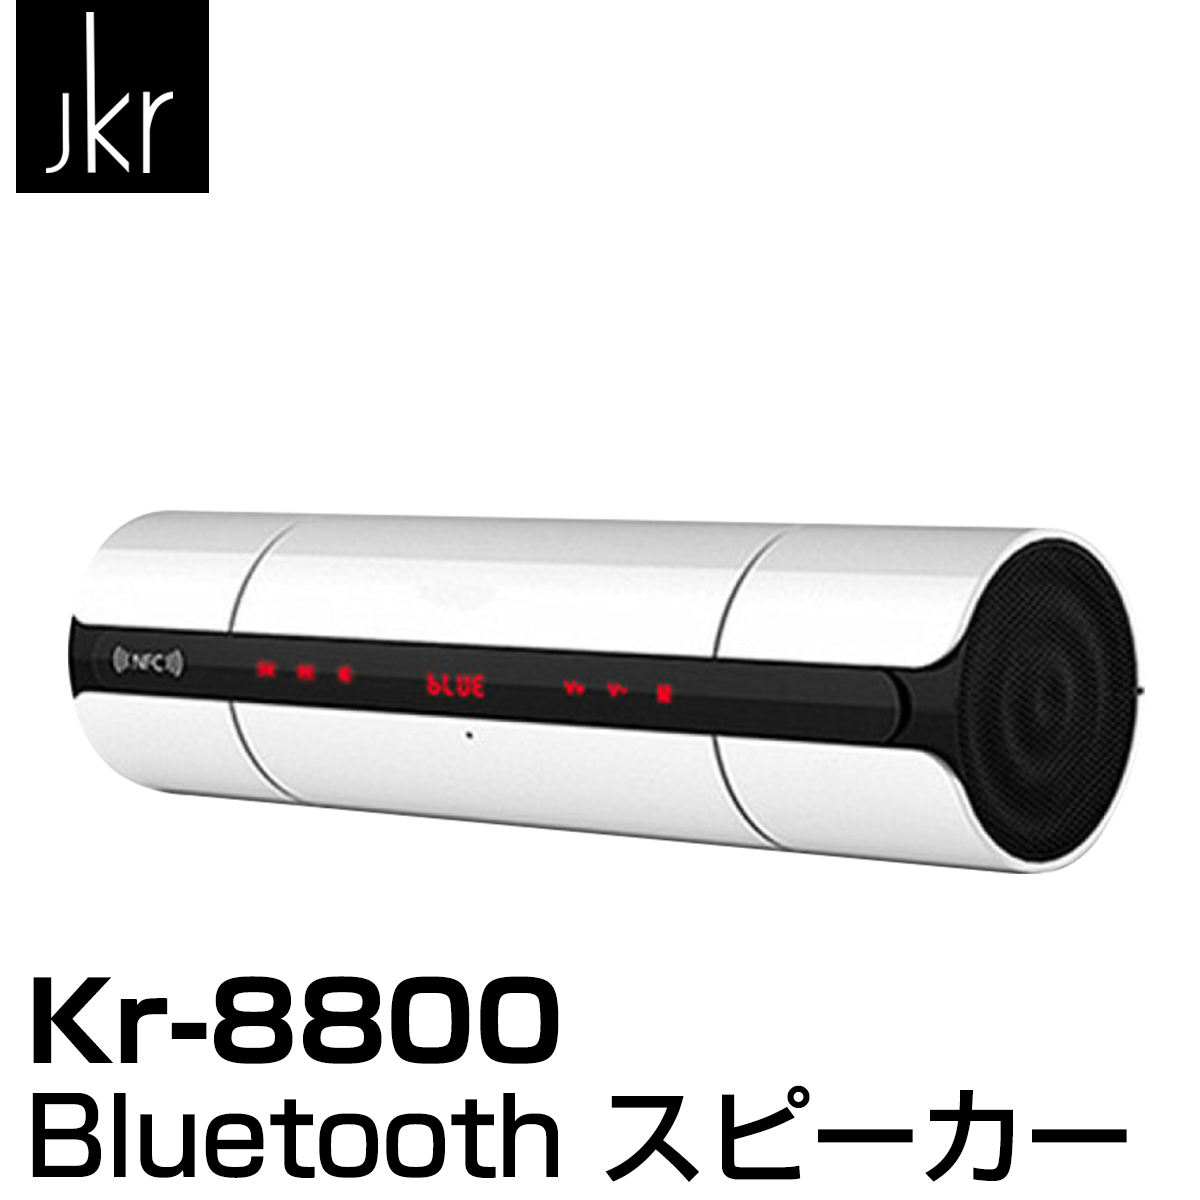 fd51b4dc87 楽天市場】スピーカー Bluetooth 高音質 ブルートゥース スピーカー大 ...